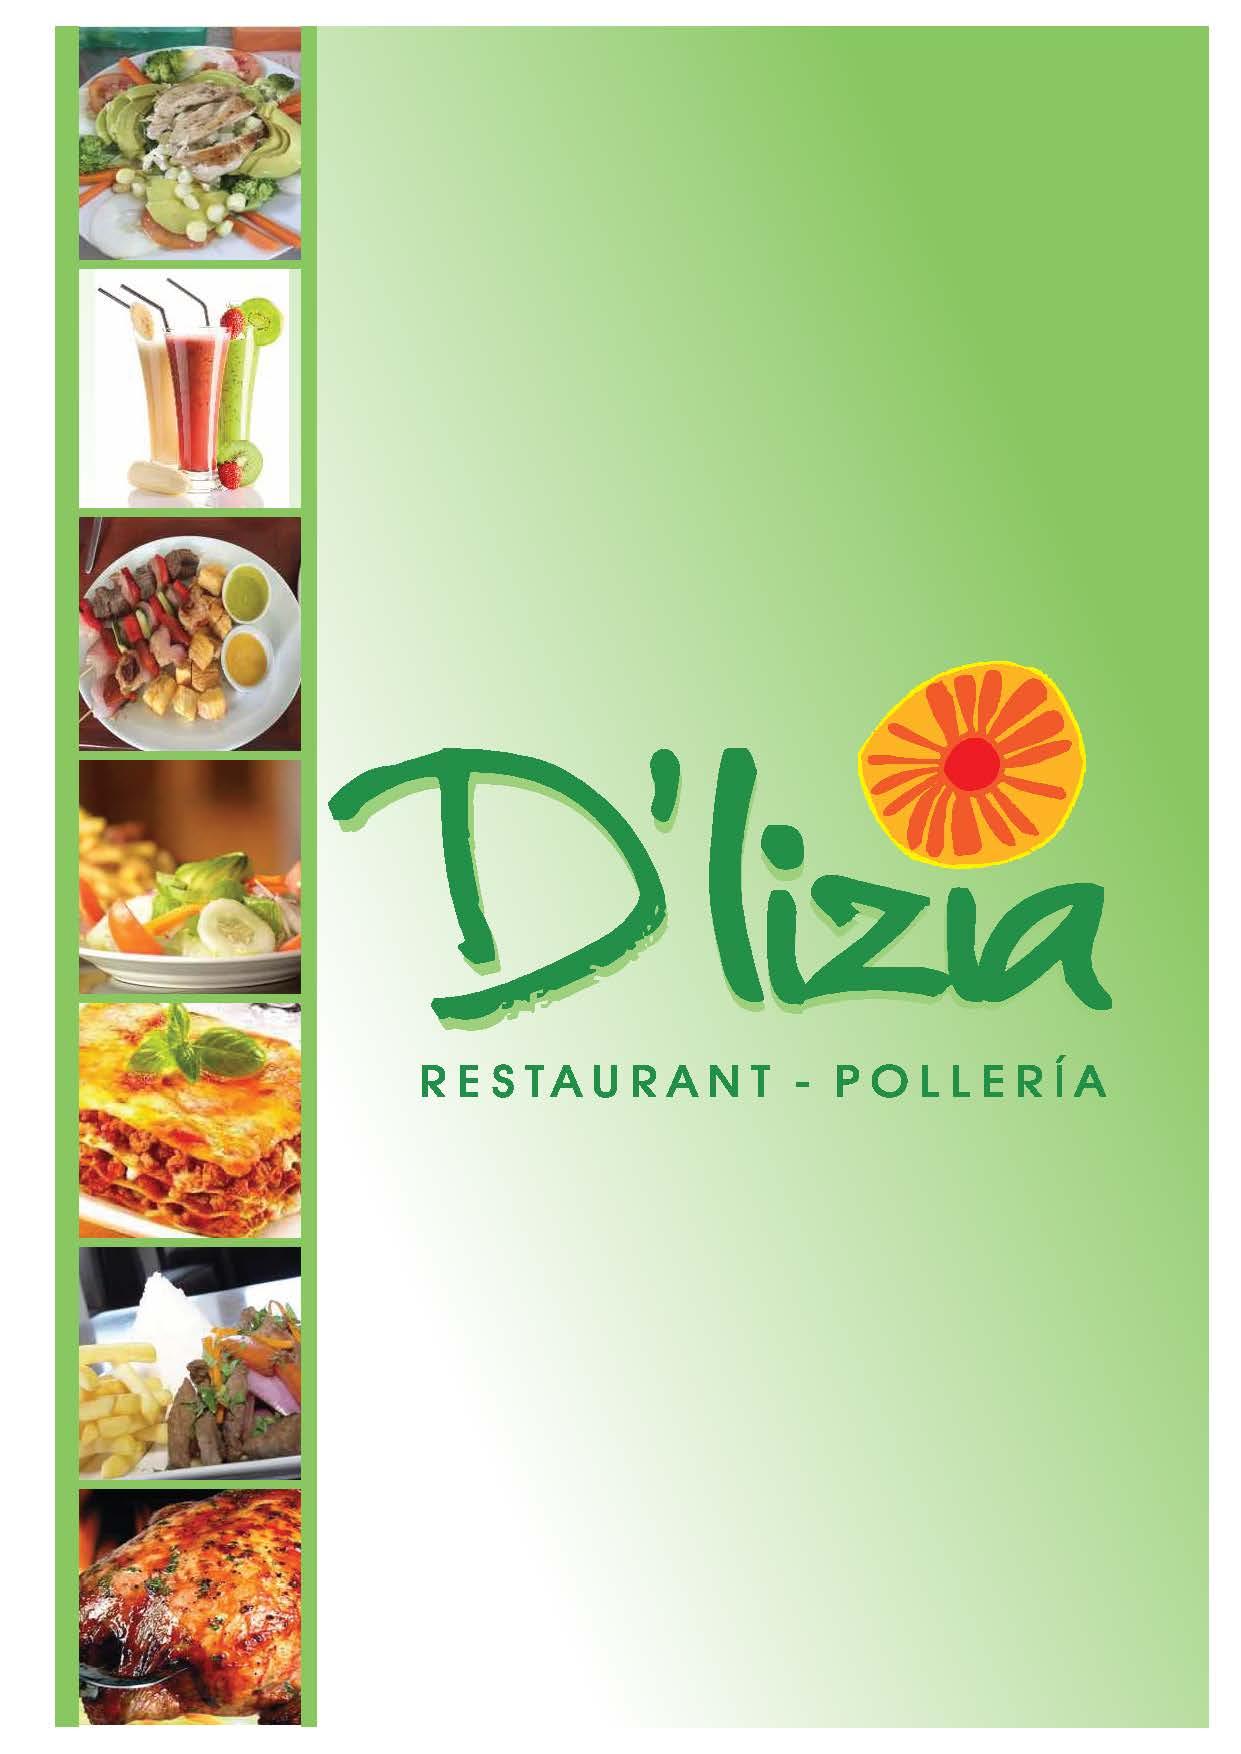 Carta D'lizia - Restaurant